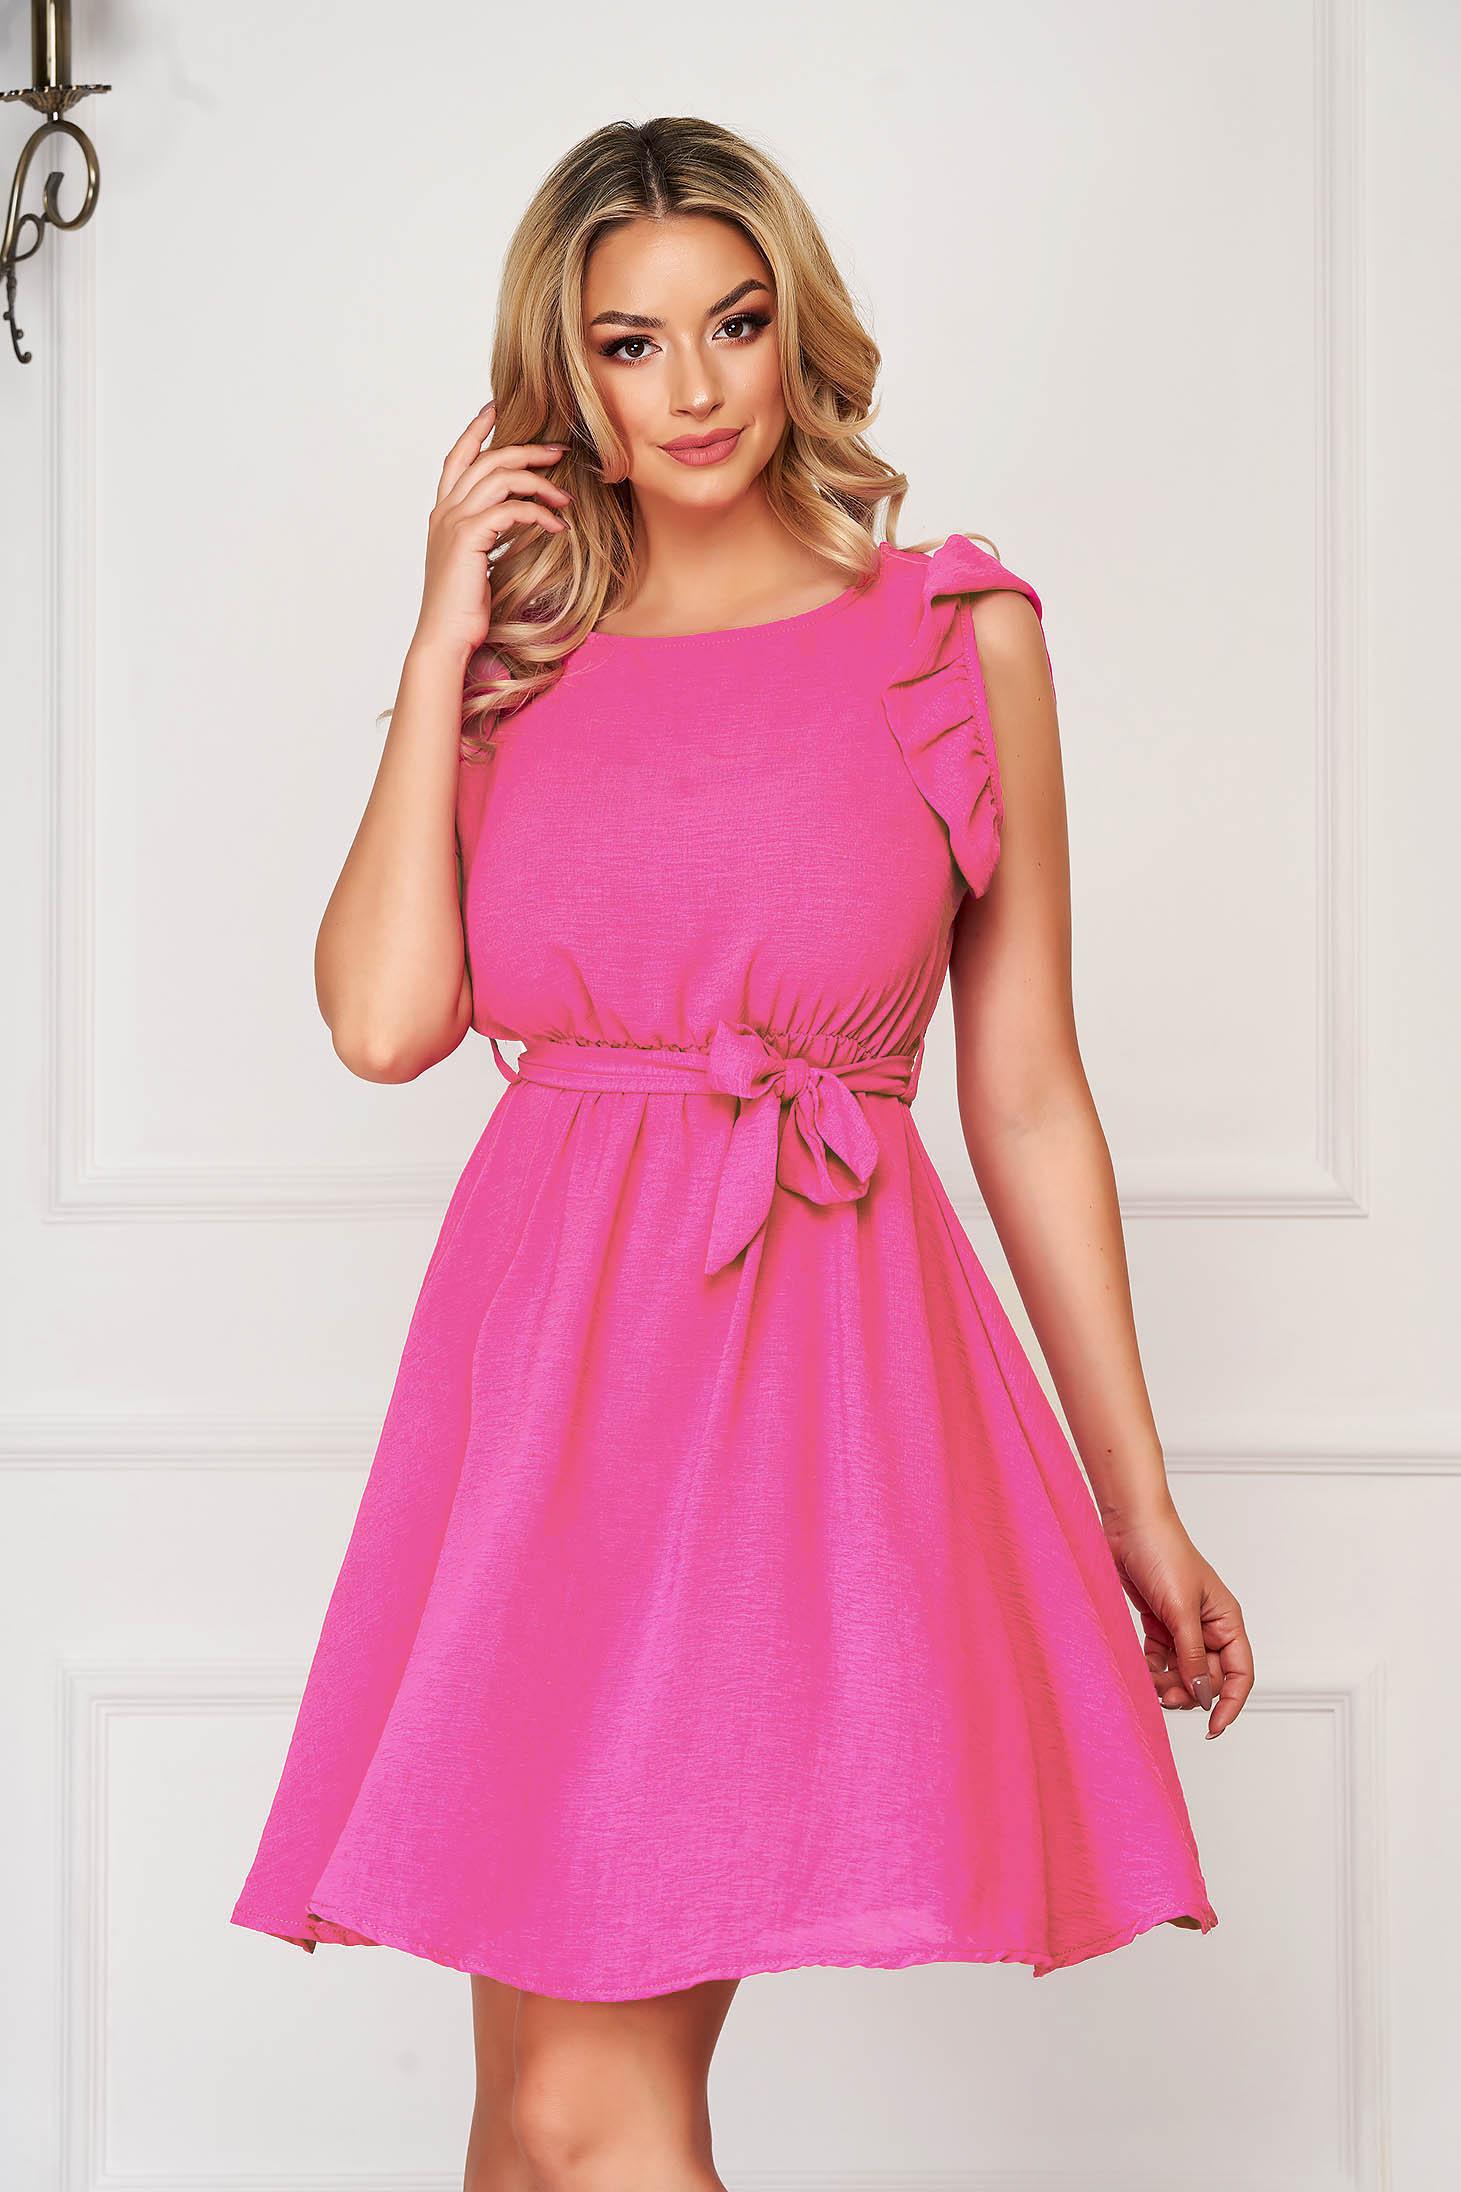 Fuchsia dress daily short cut sleeveless thin fabric